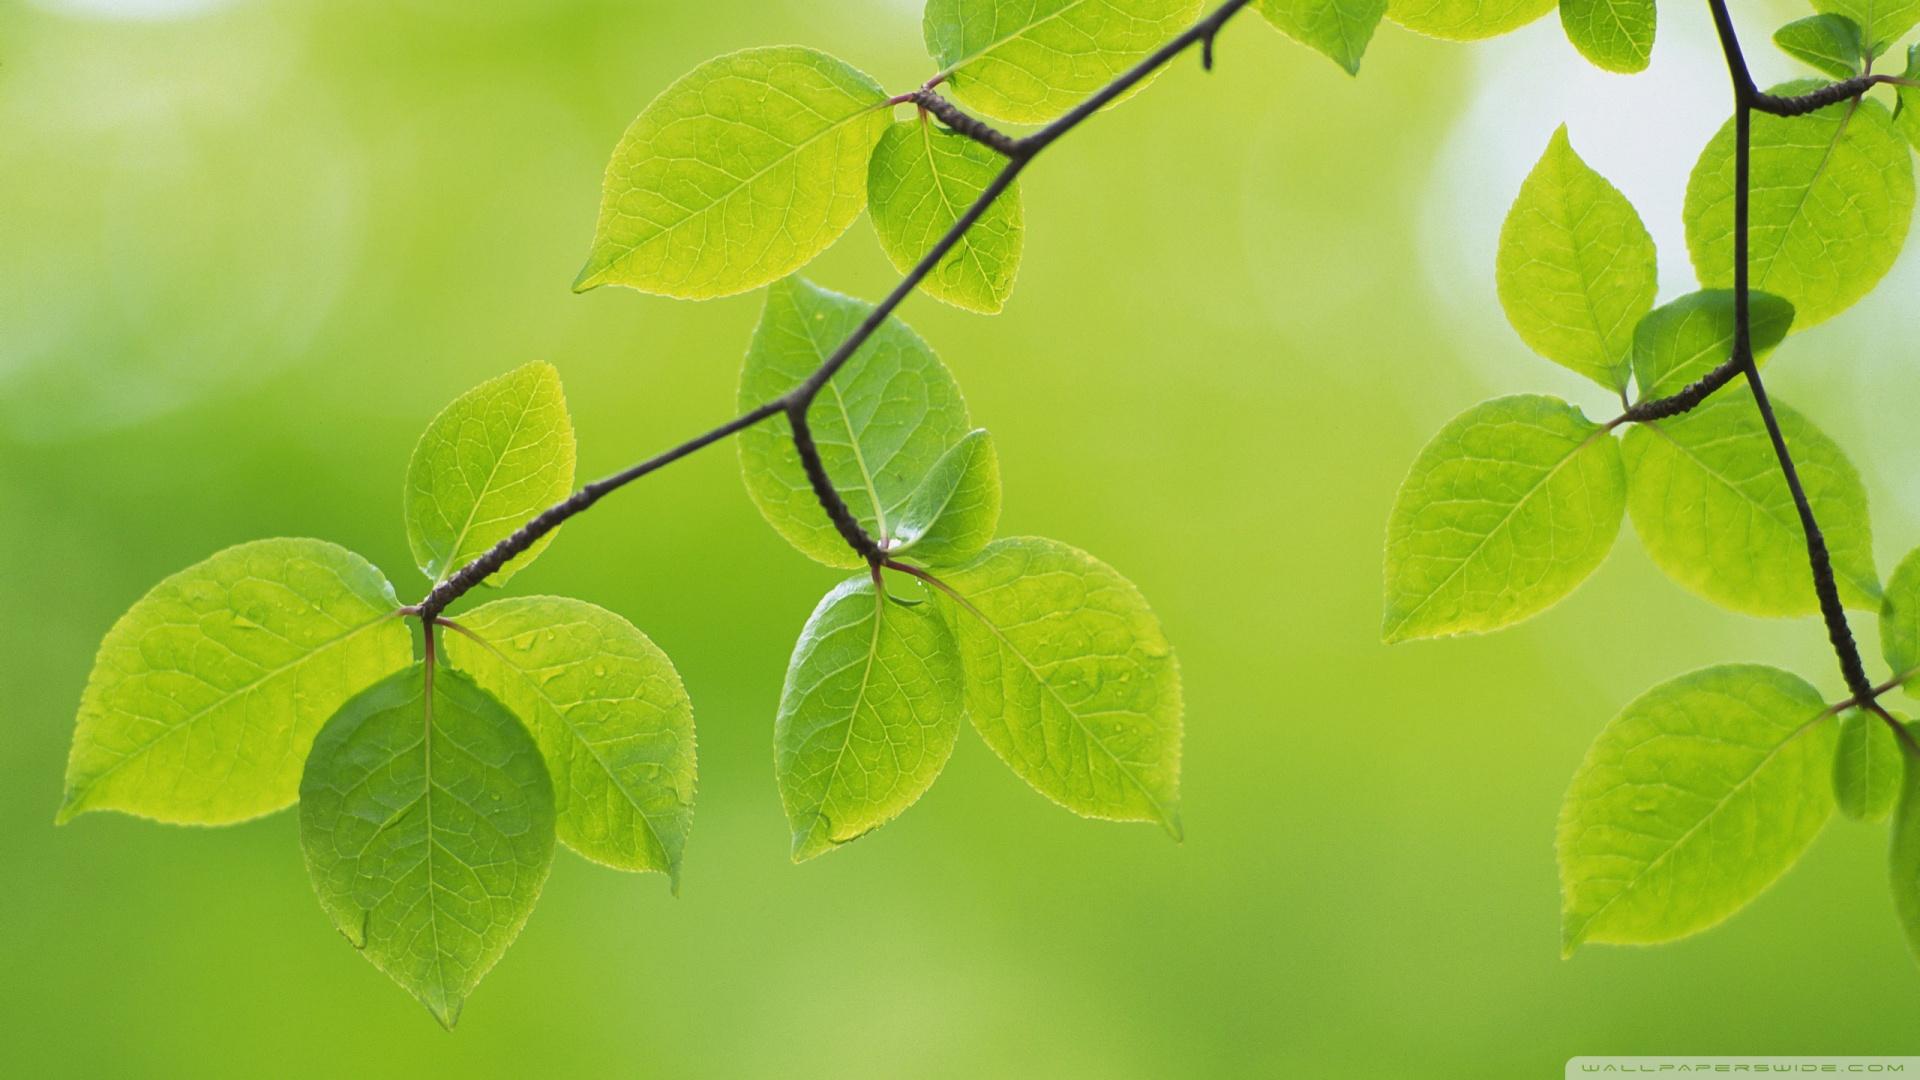 Green leaves branch